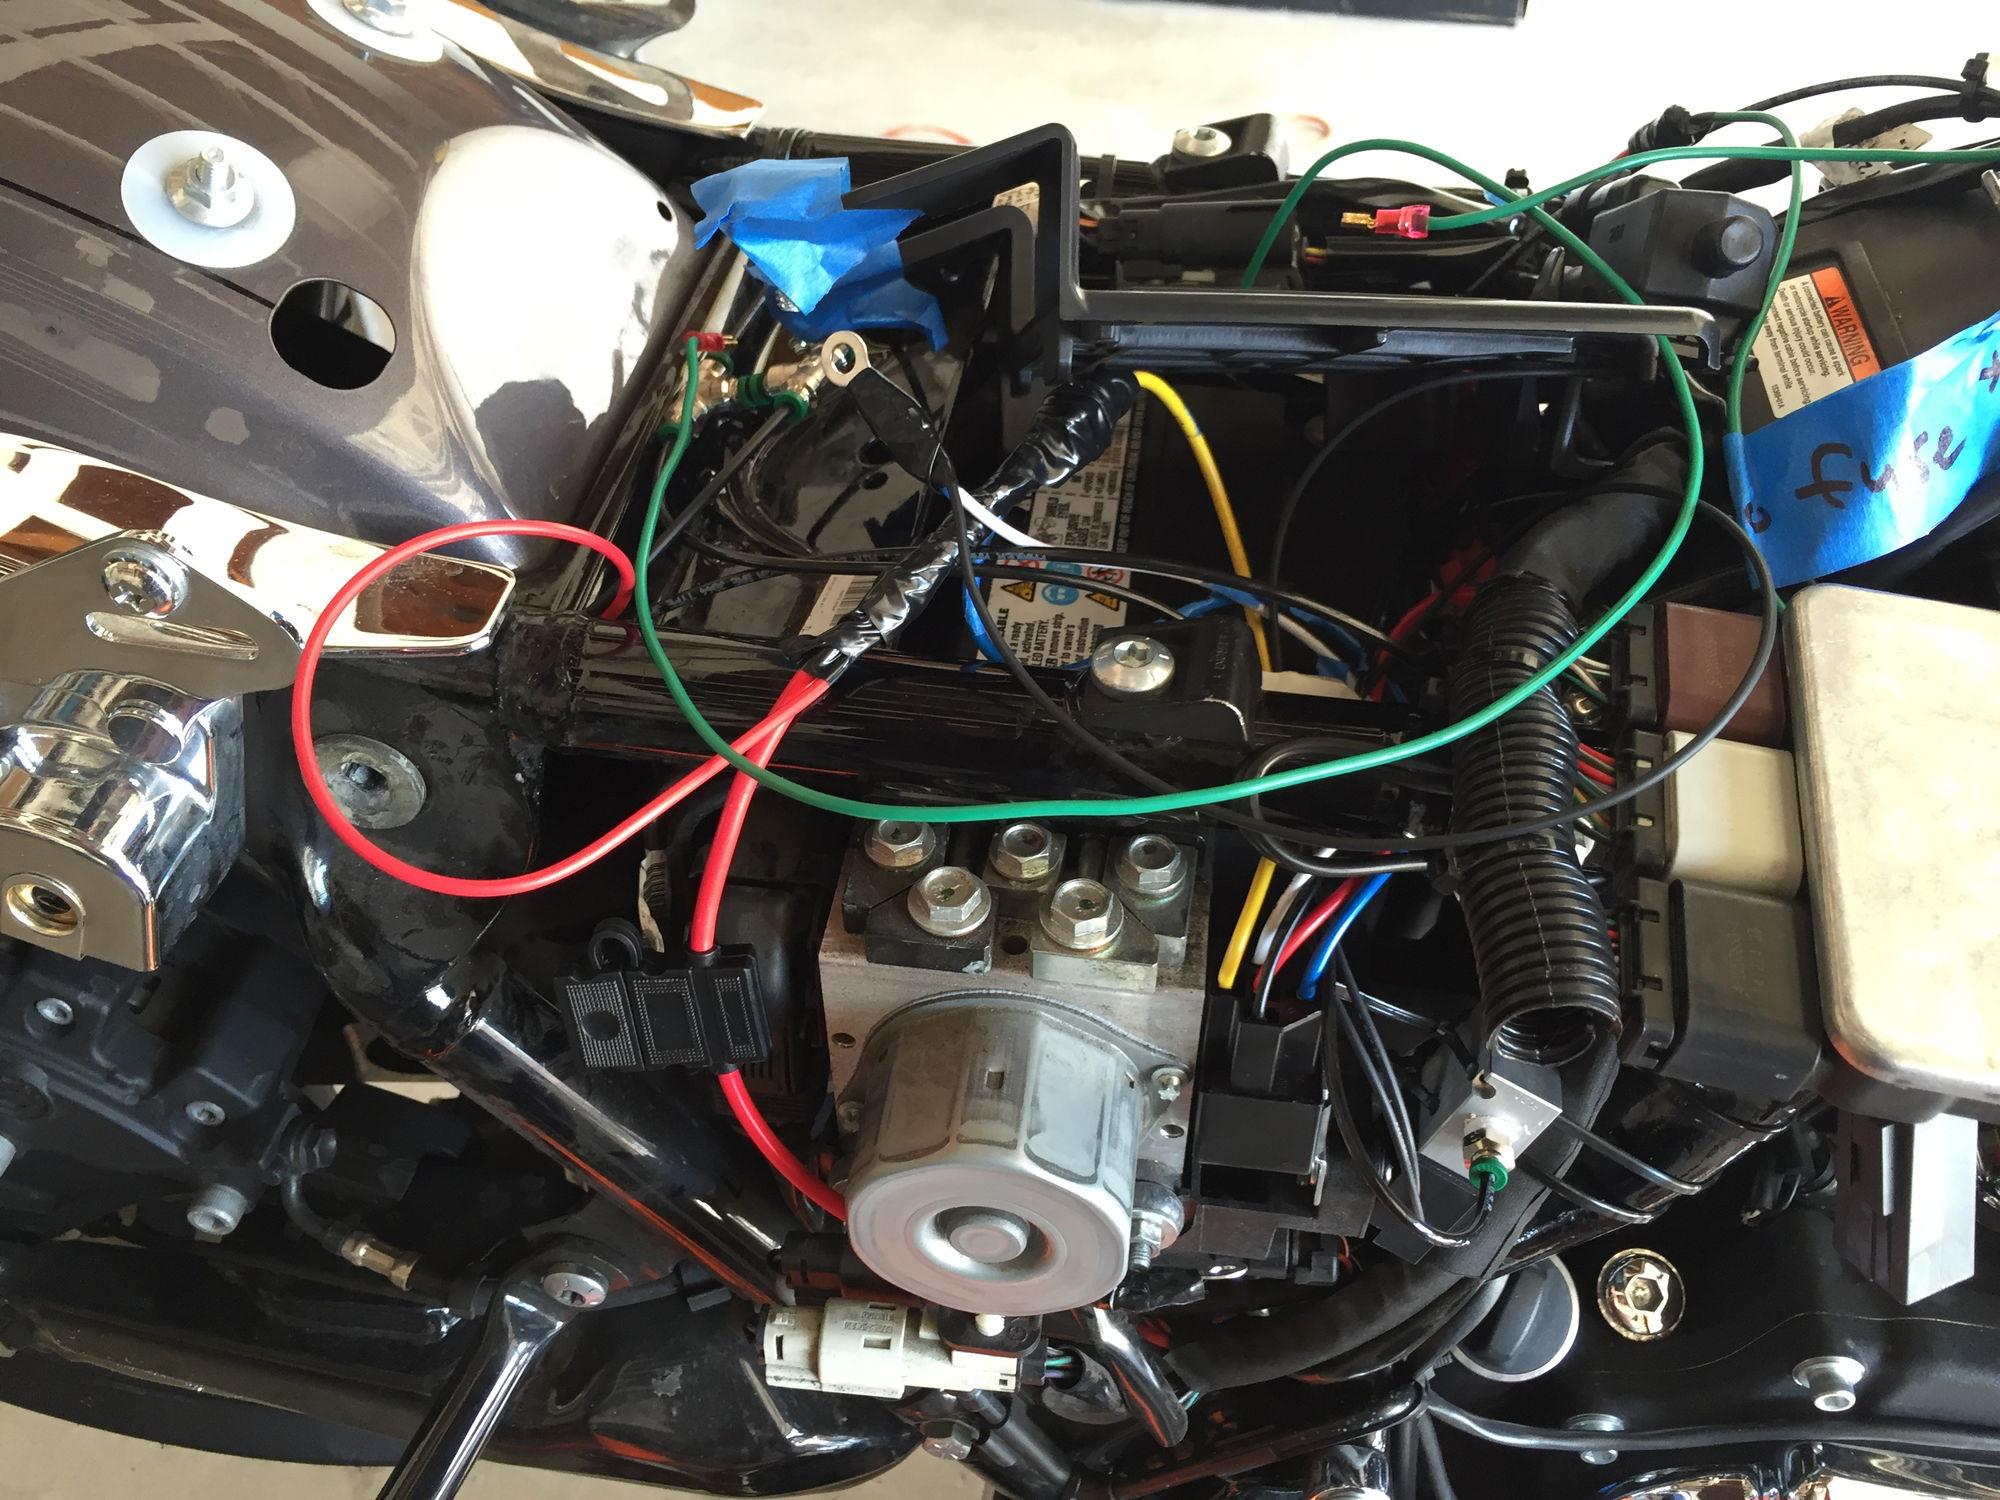 80-image_0bdae761383595eceeb4012510e7d98d1bed7128 Harley Davidson Air Ride Wiring Diagram on